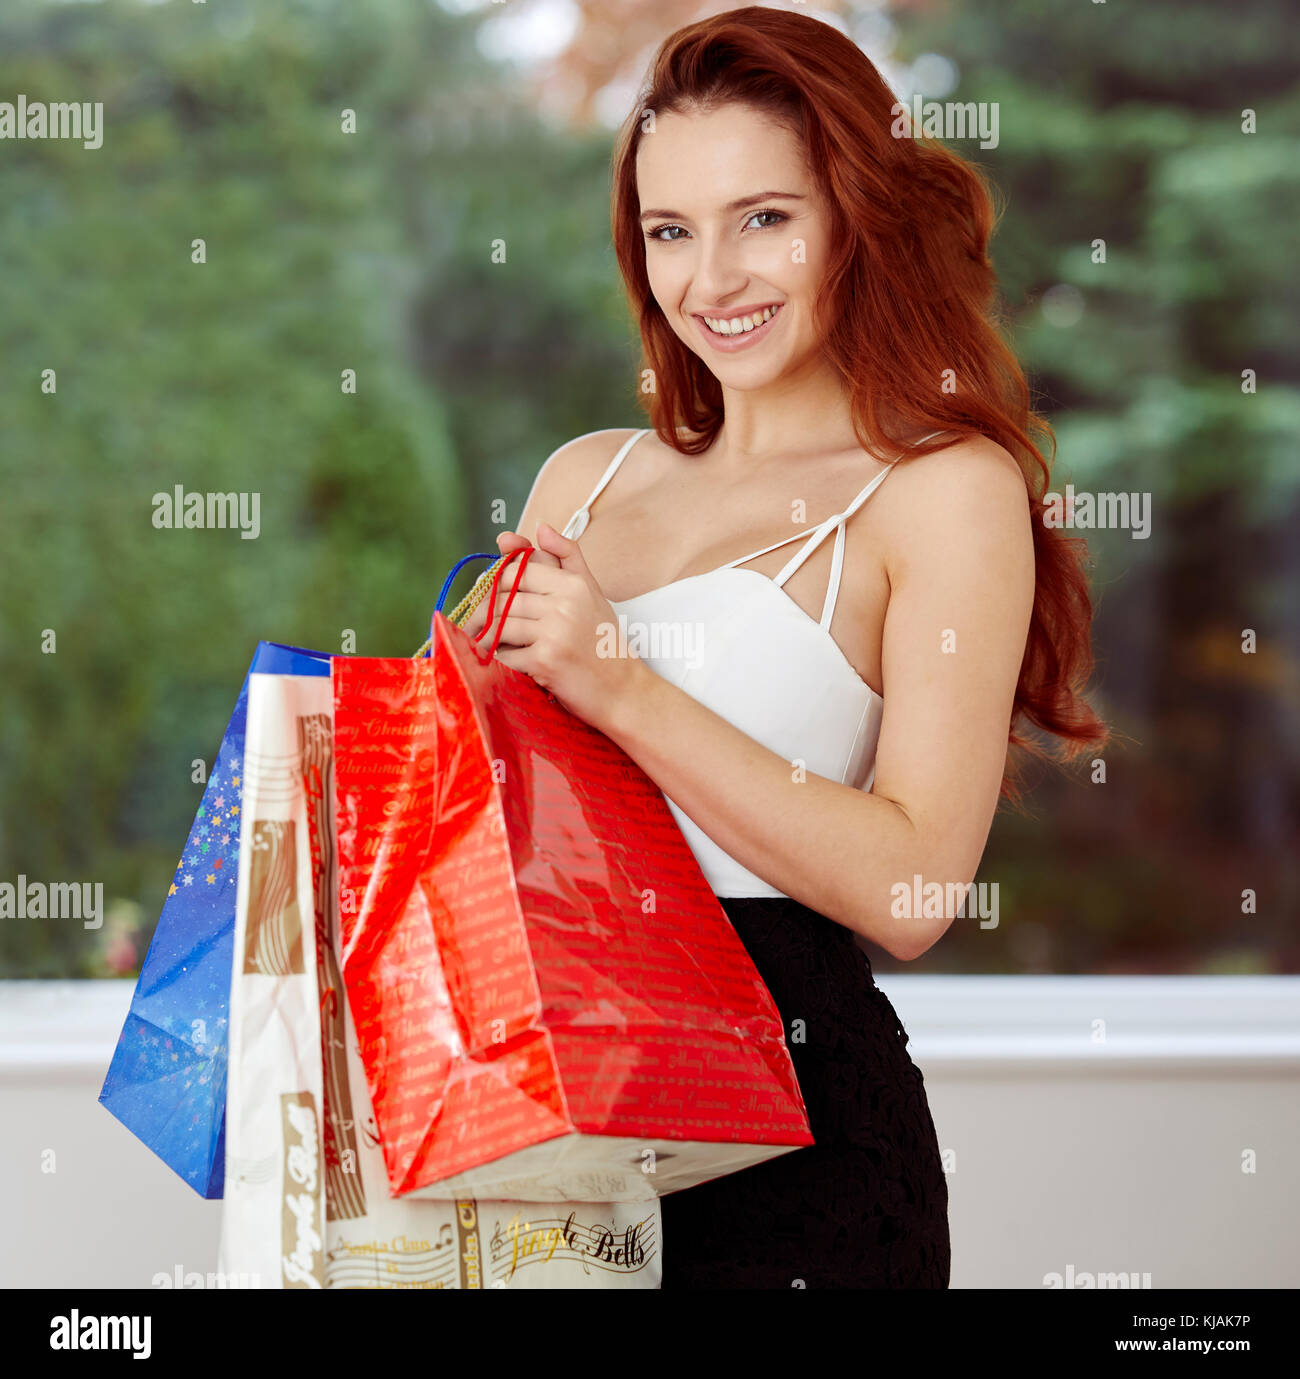 Beautiful girl holding shopping bags - Stock Image